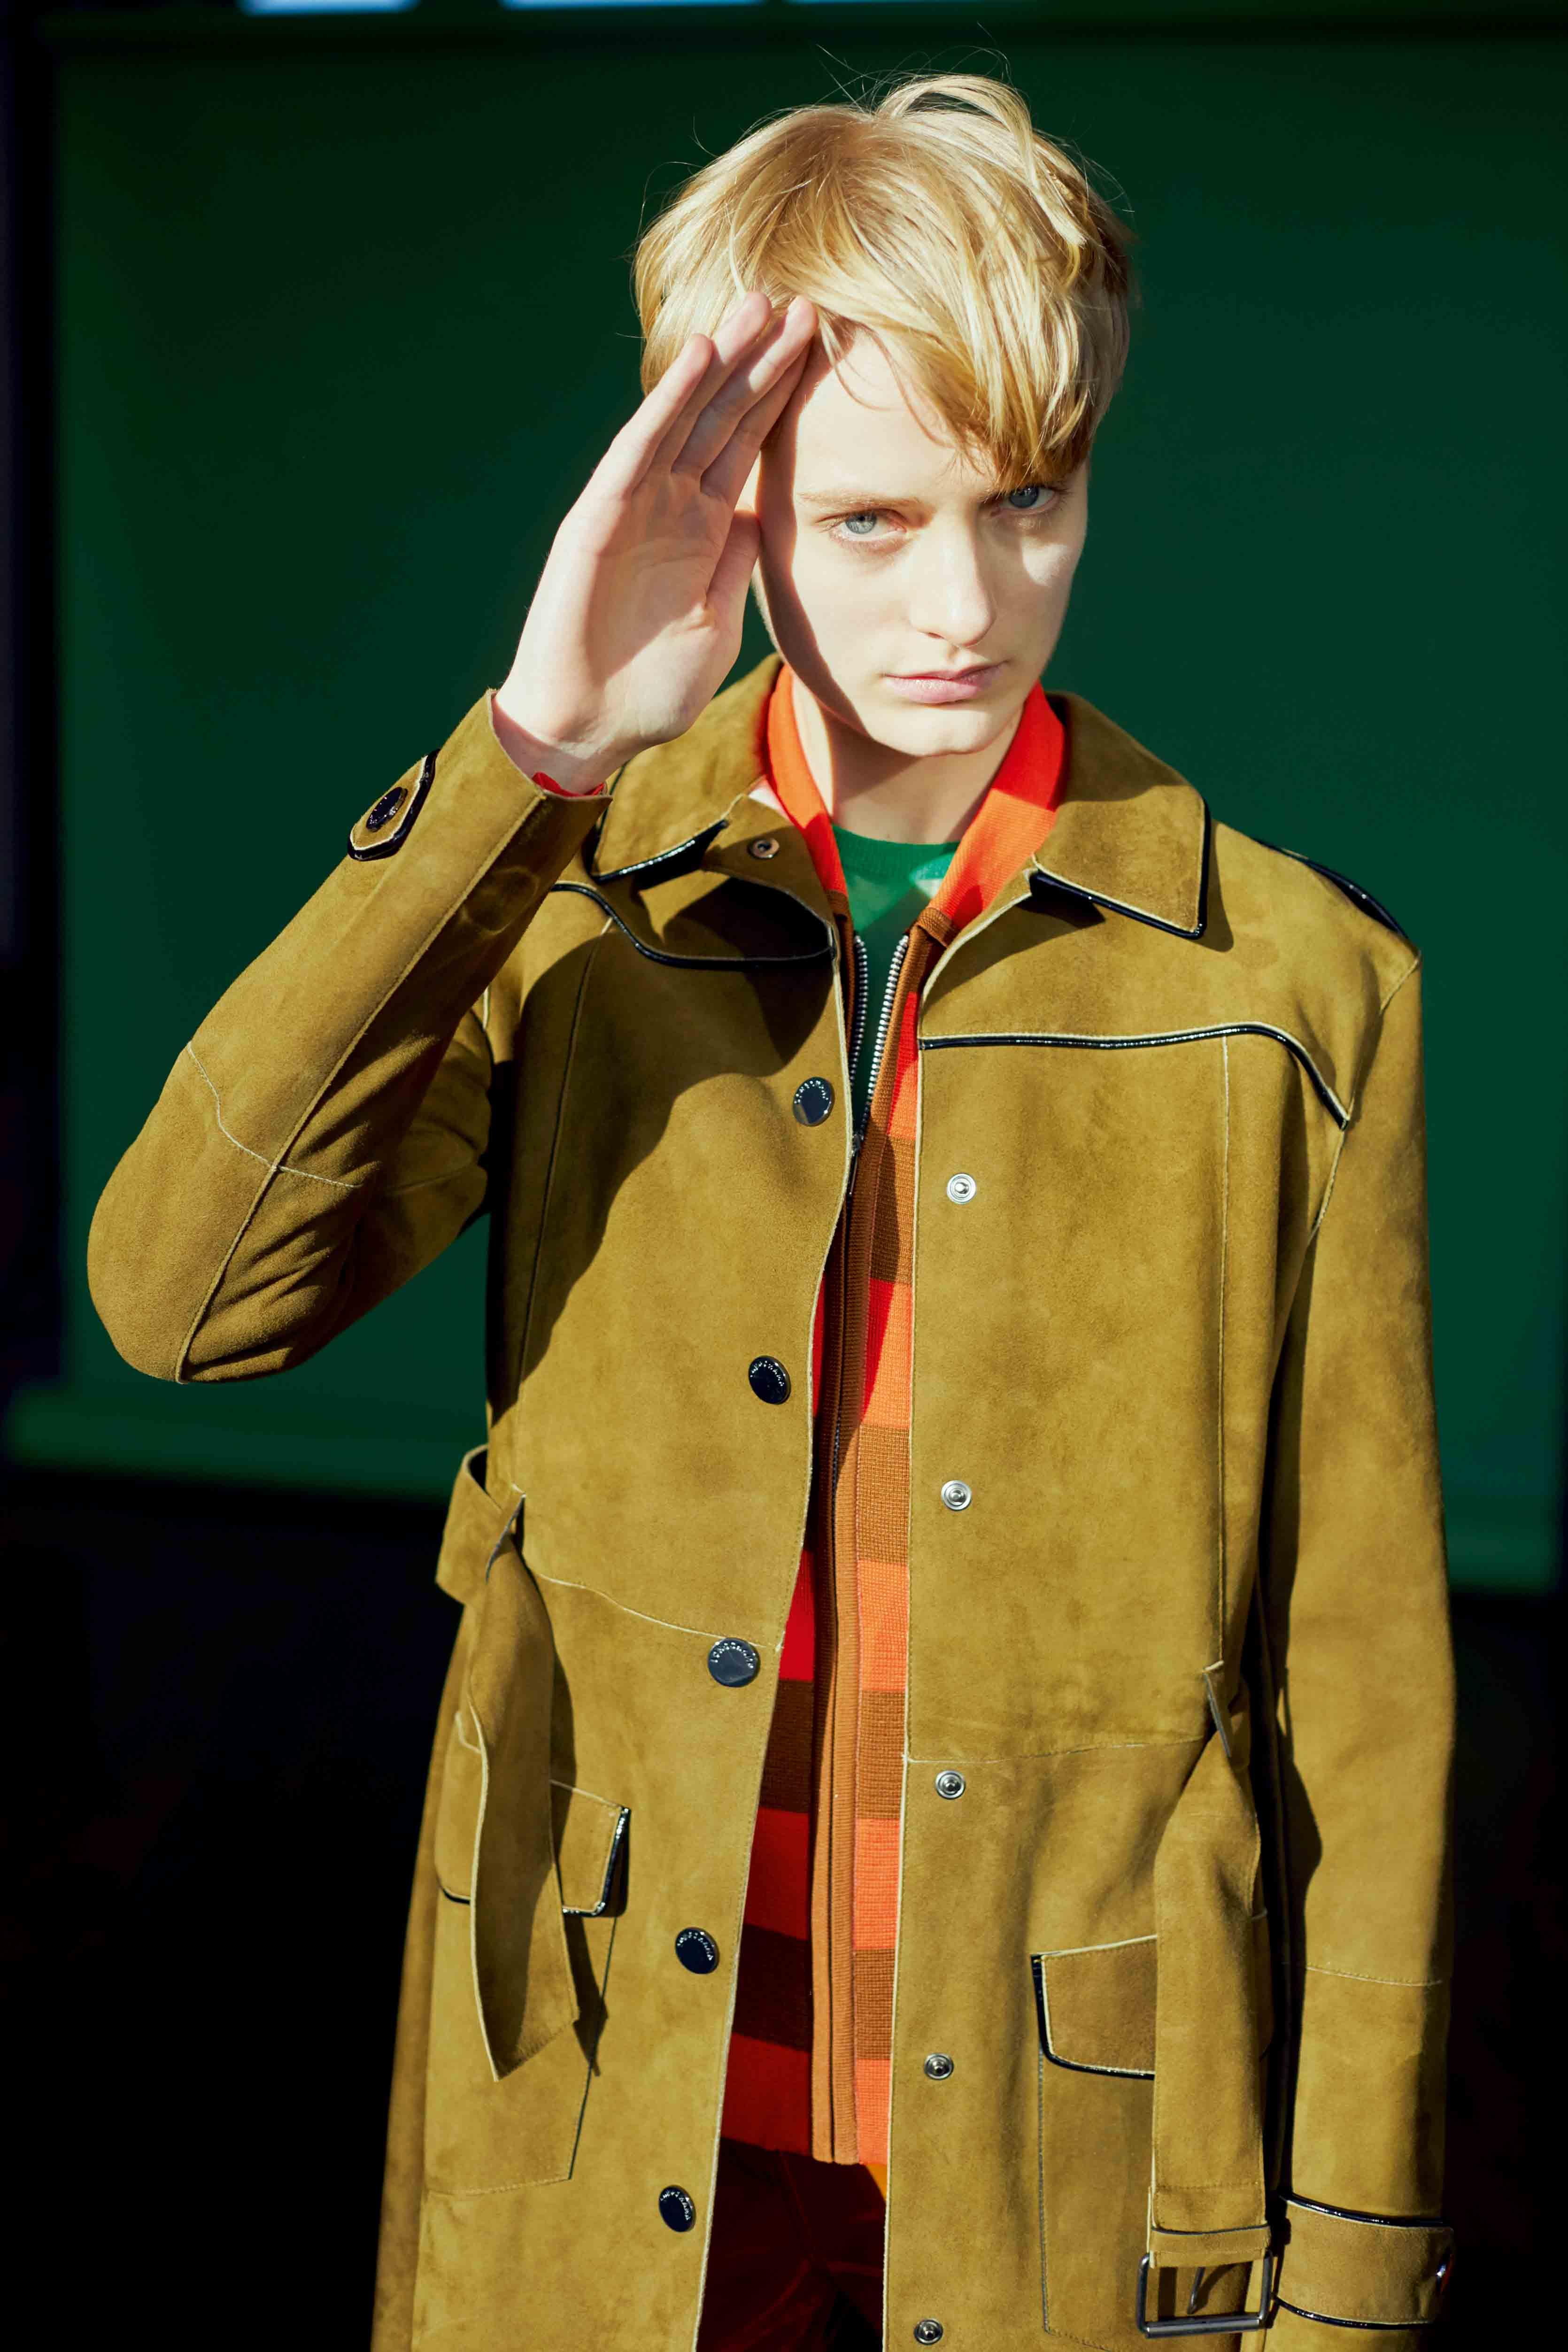 Suede calfskin coat, LONGCHAMP. Zip sweater, JOSEPH.